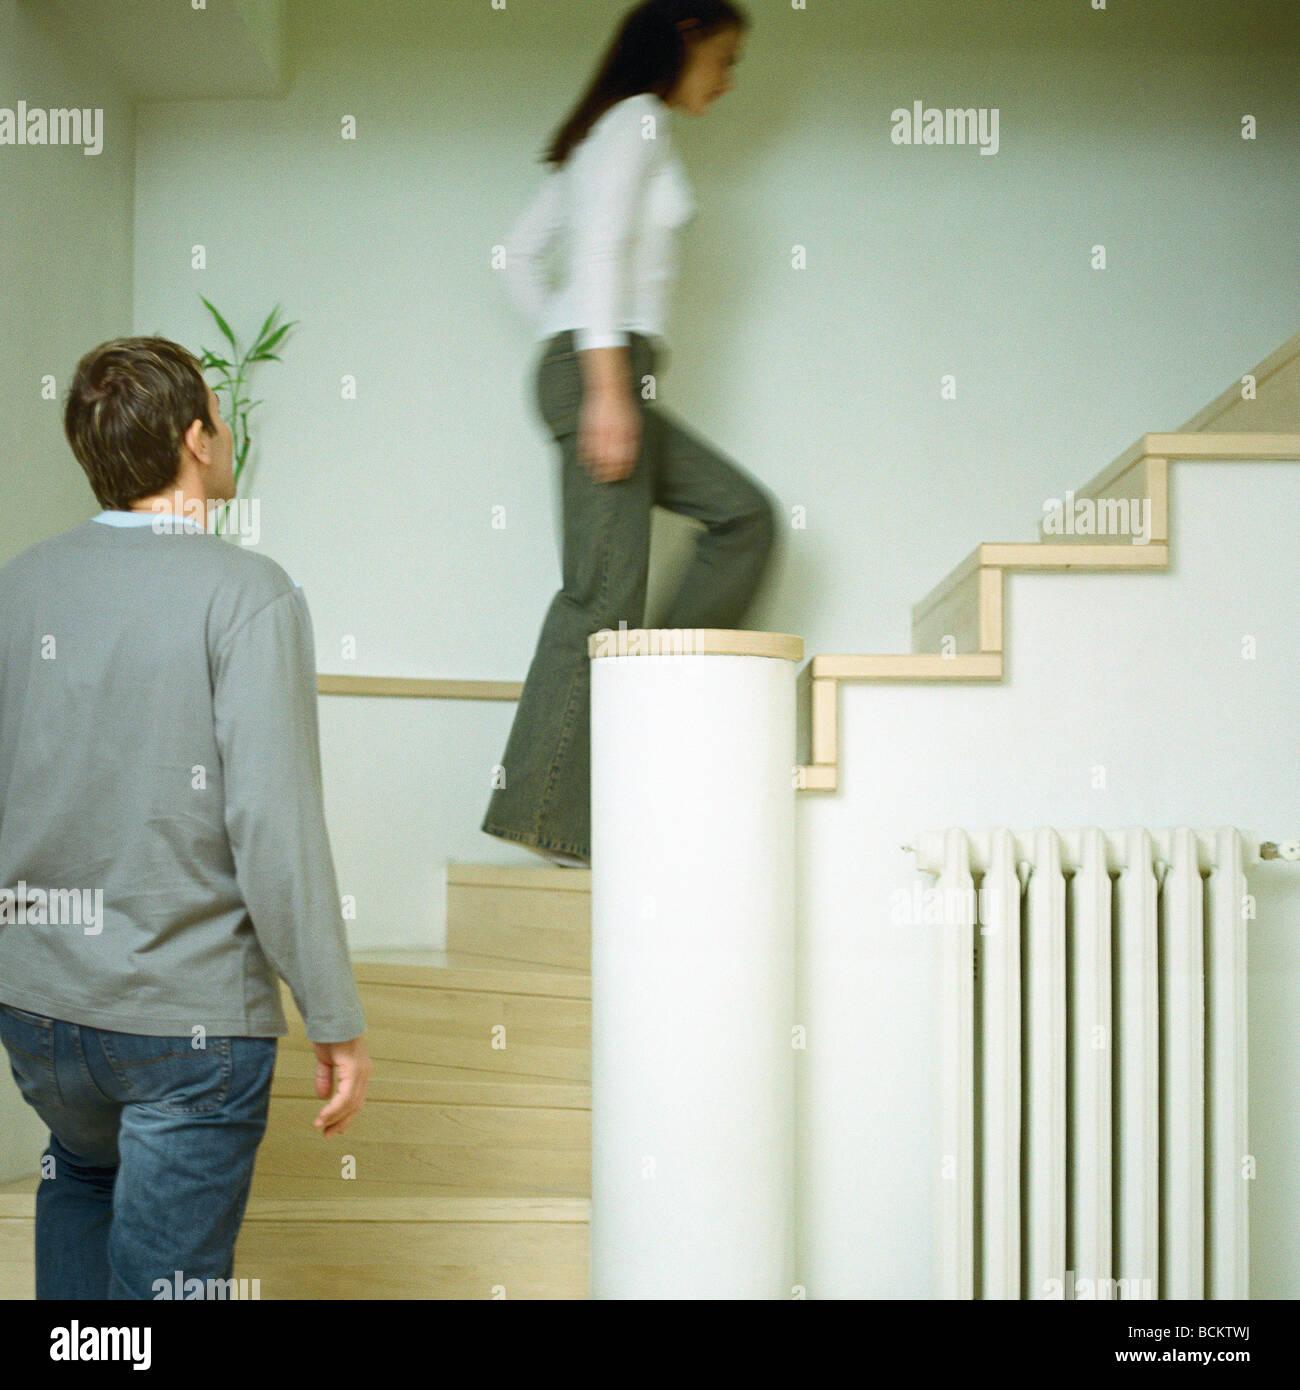 Man and woman walking up steps, interior - Stock Image